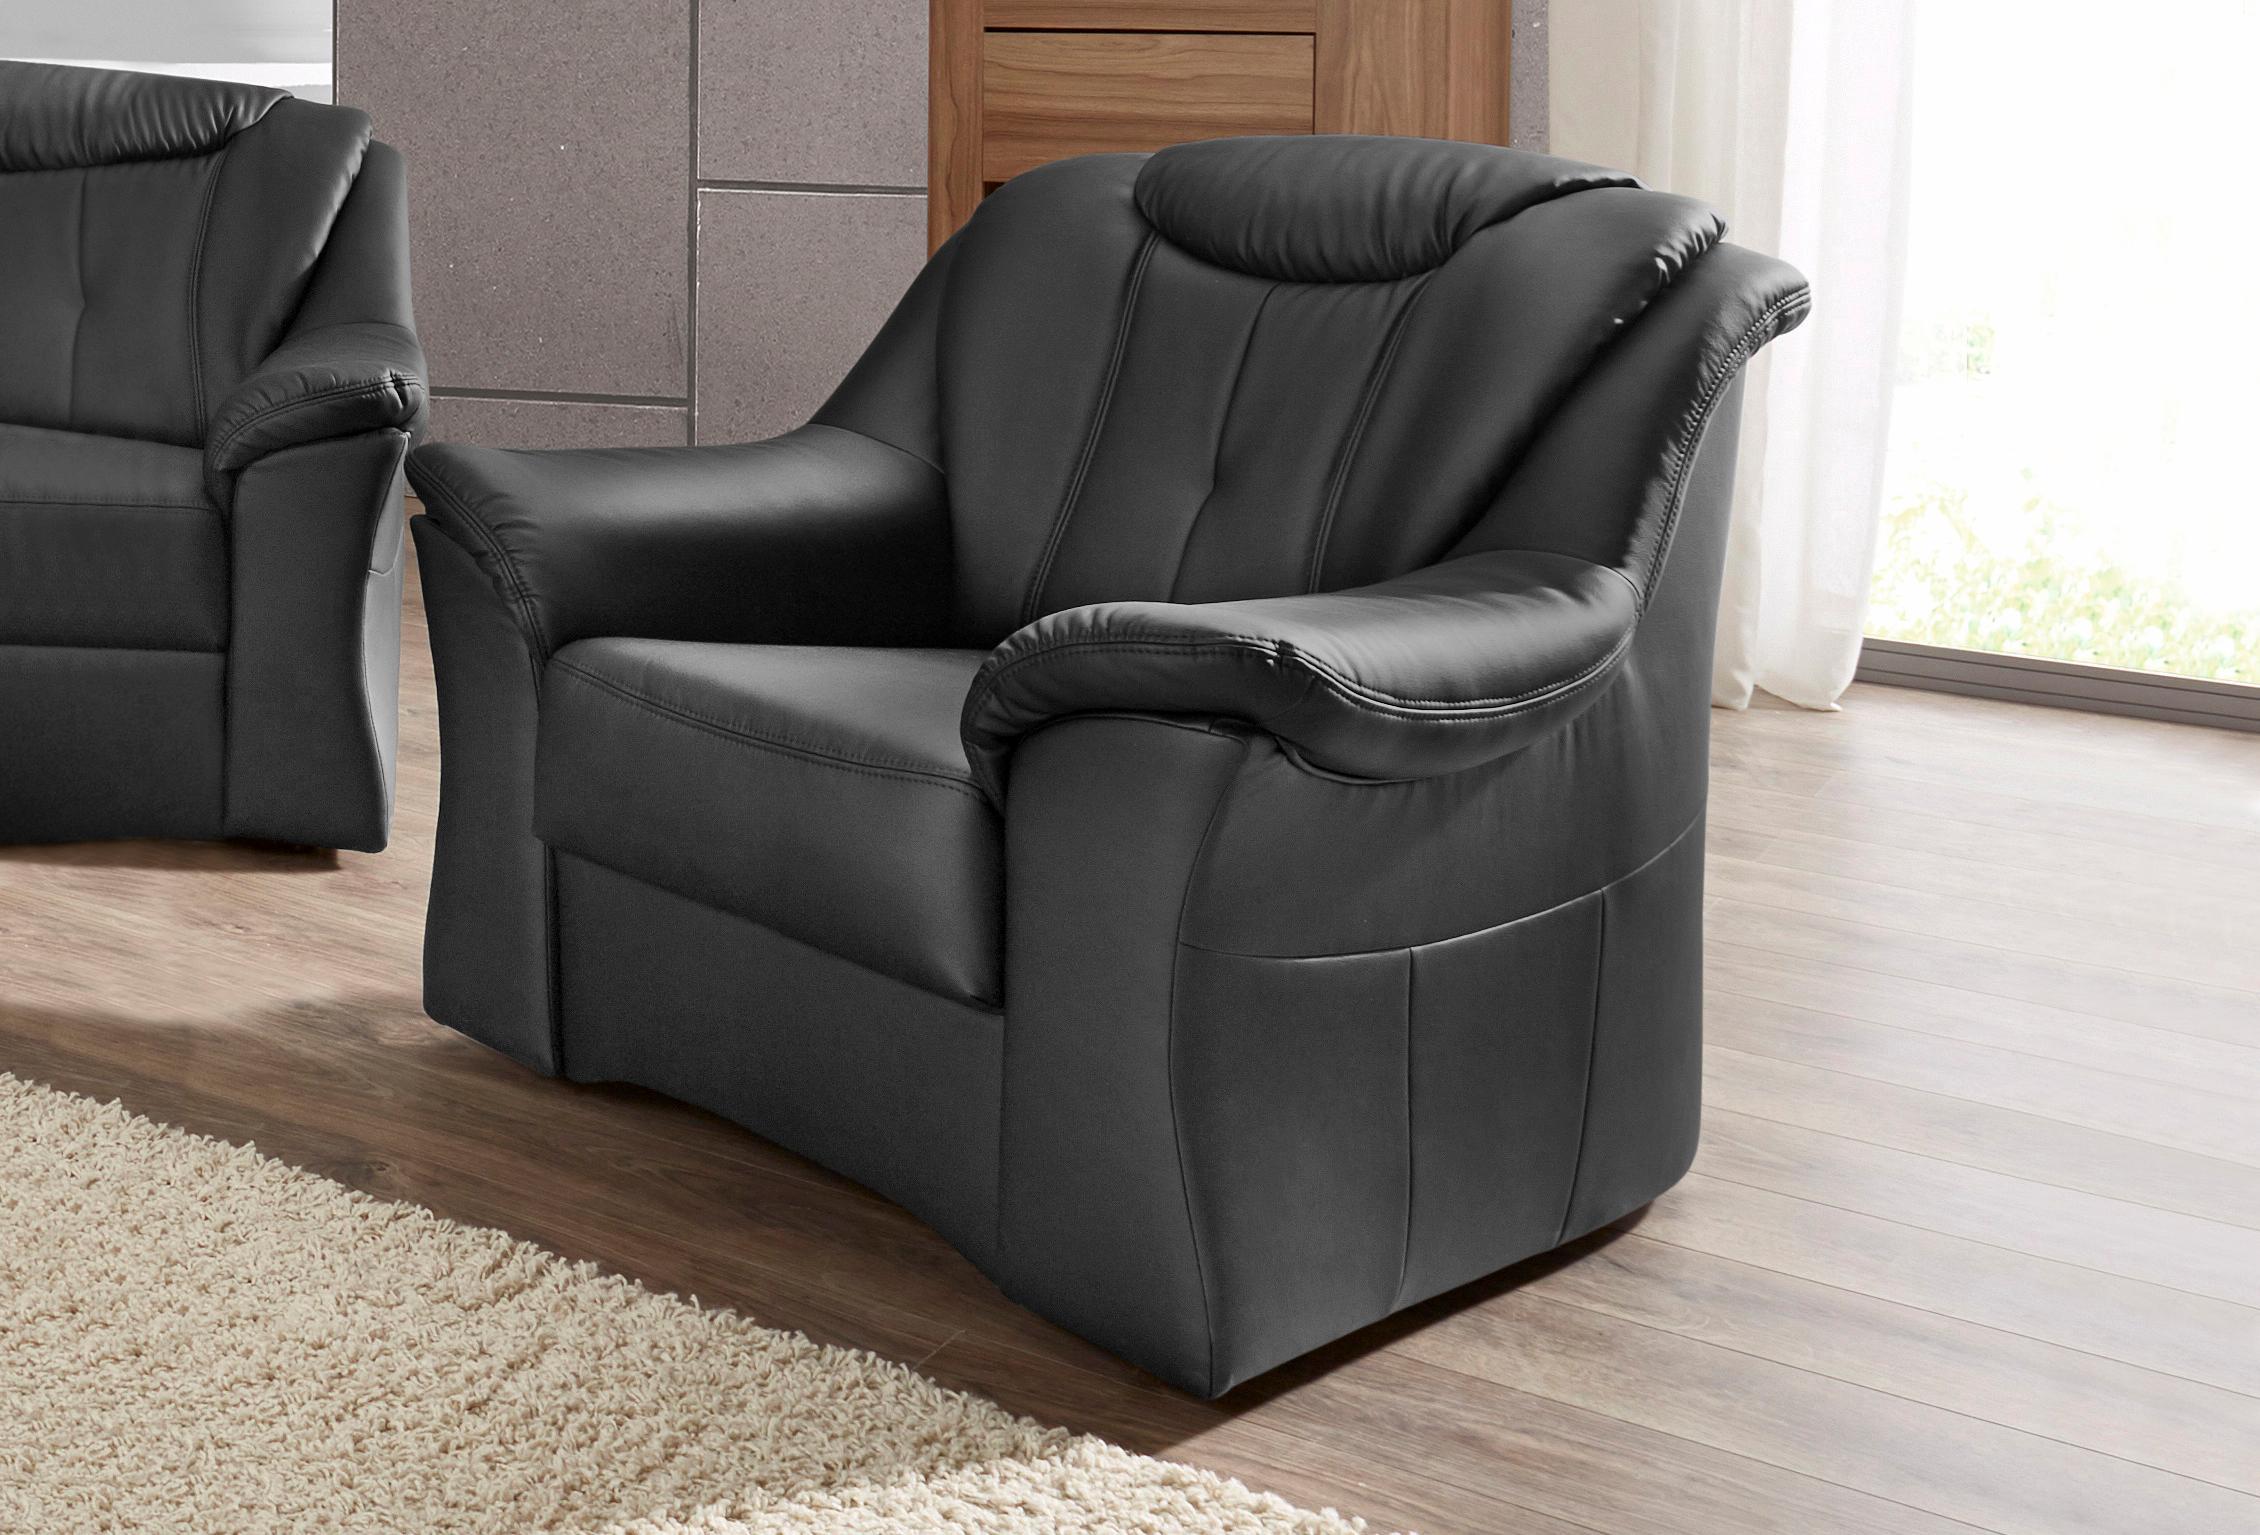 sit&more Sessel, mit komfortablem Federkern